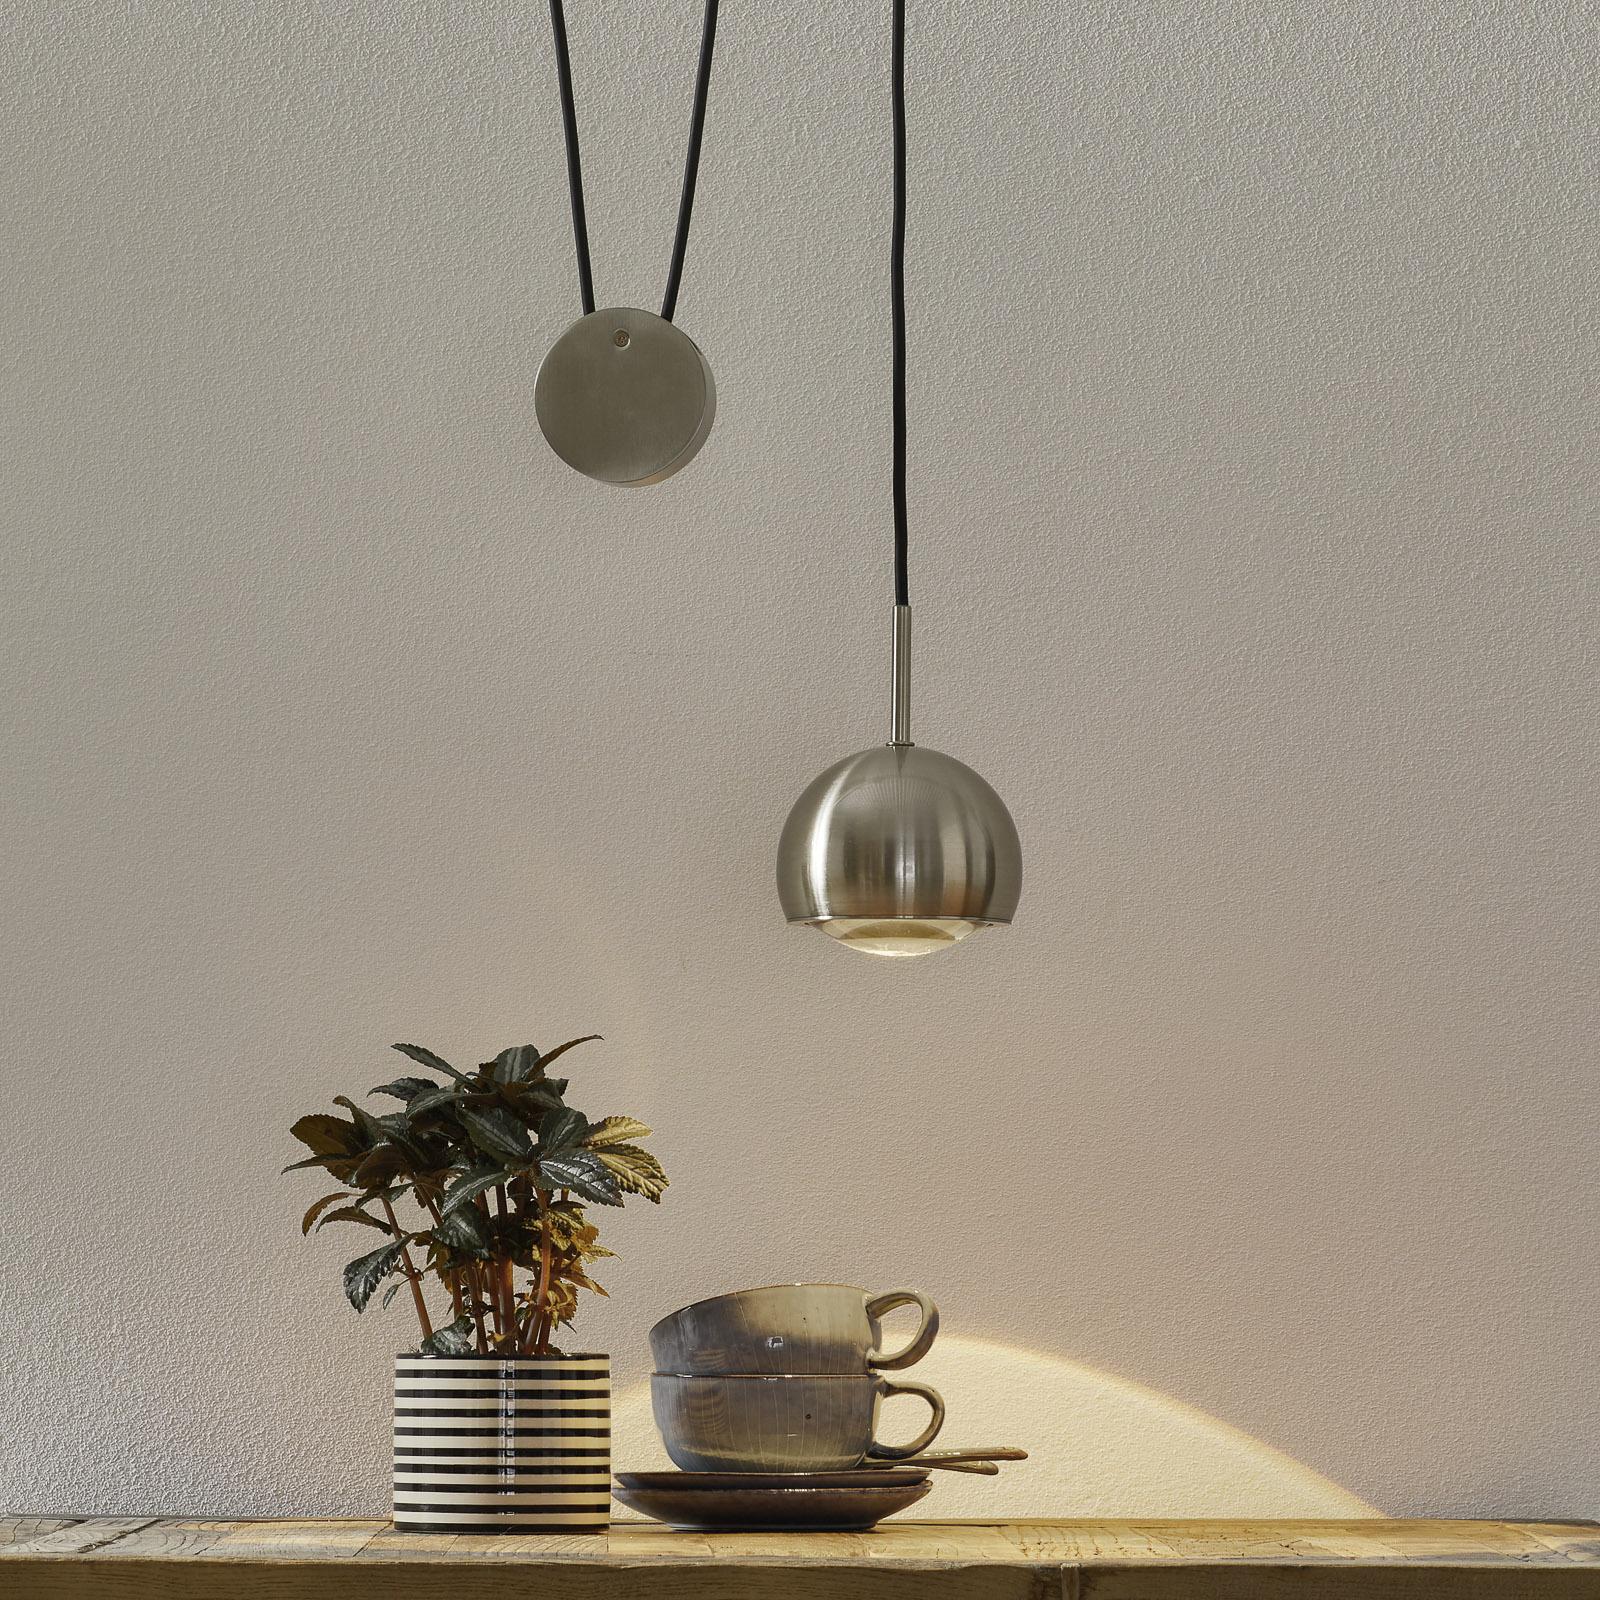 Paul Neuhaus Q-ADAM LED-riippuvalaisin Smart Home